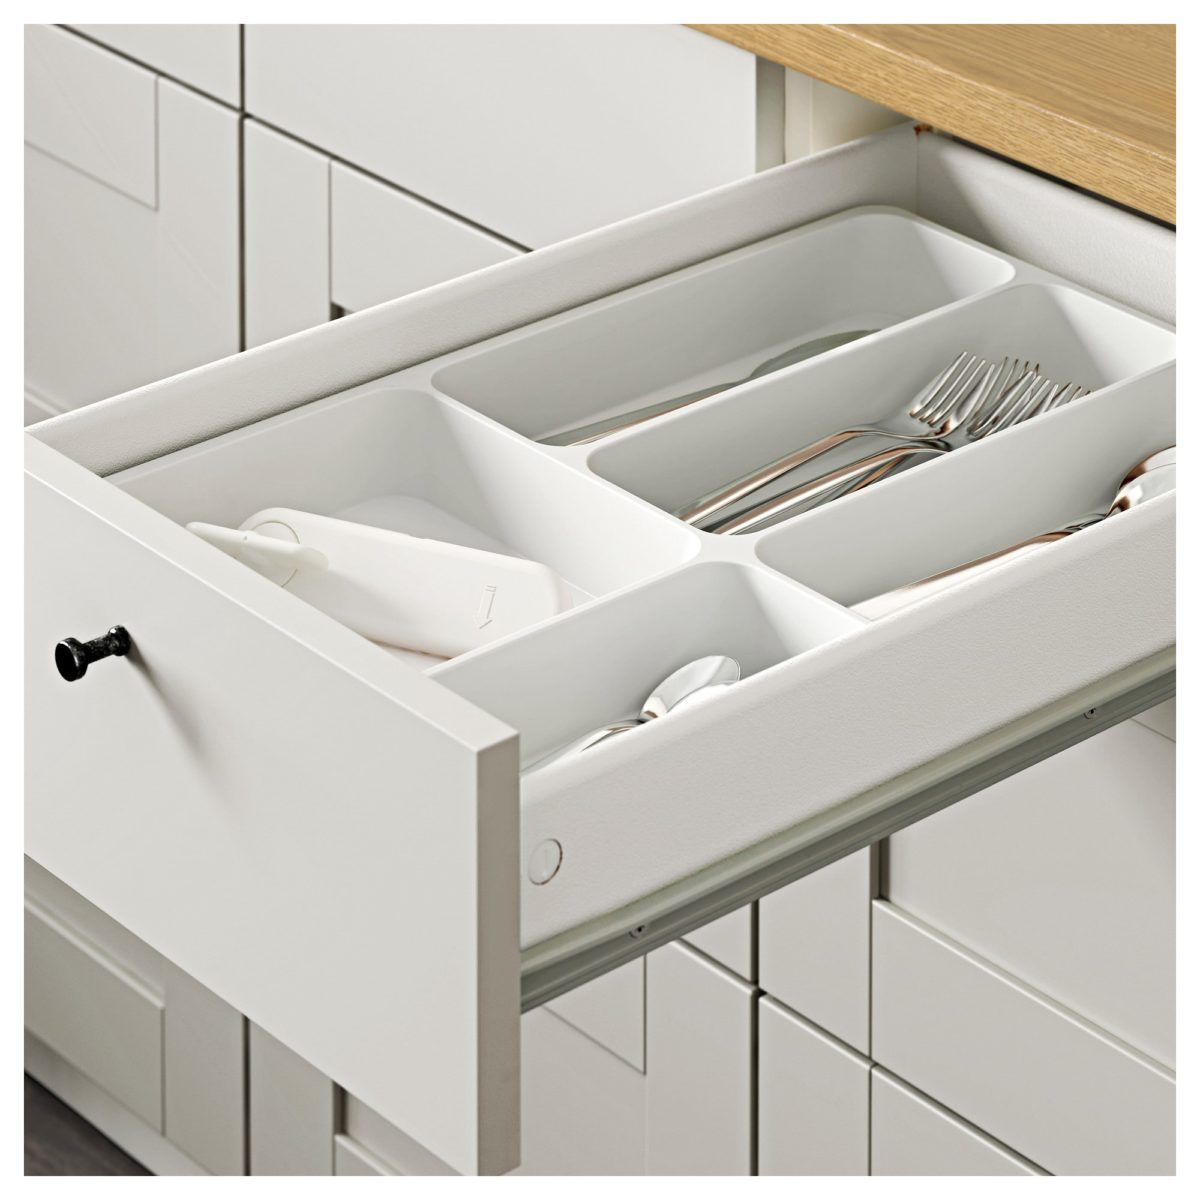 Catalogo cucine ikea 2019 - Ikea rivestimenti cucina ...